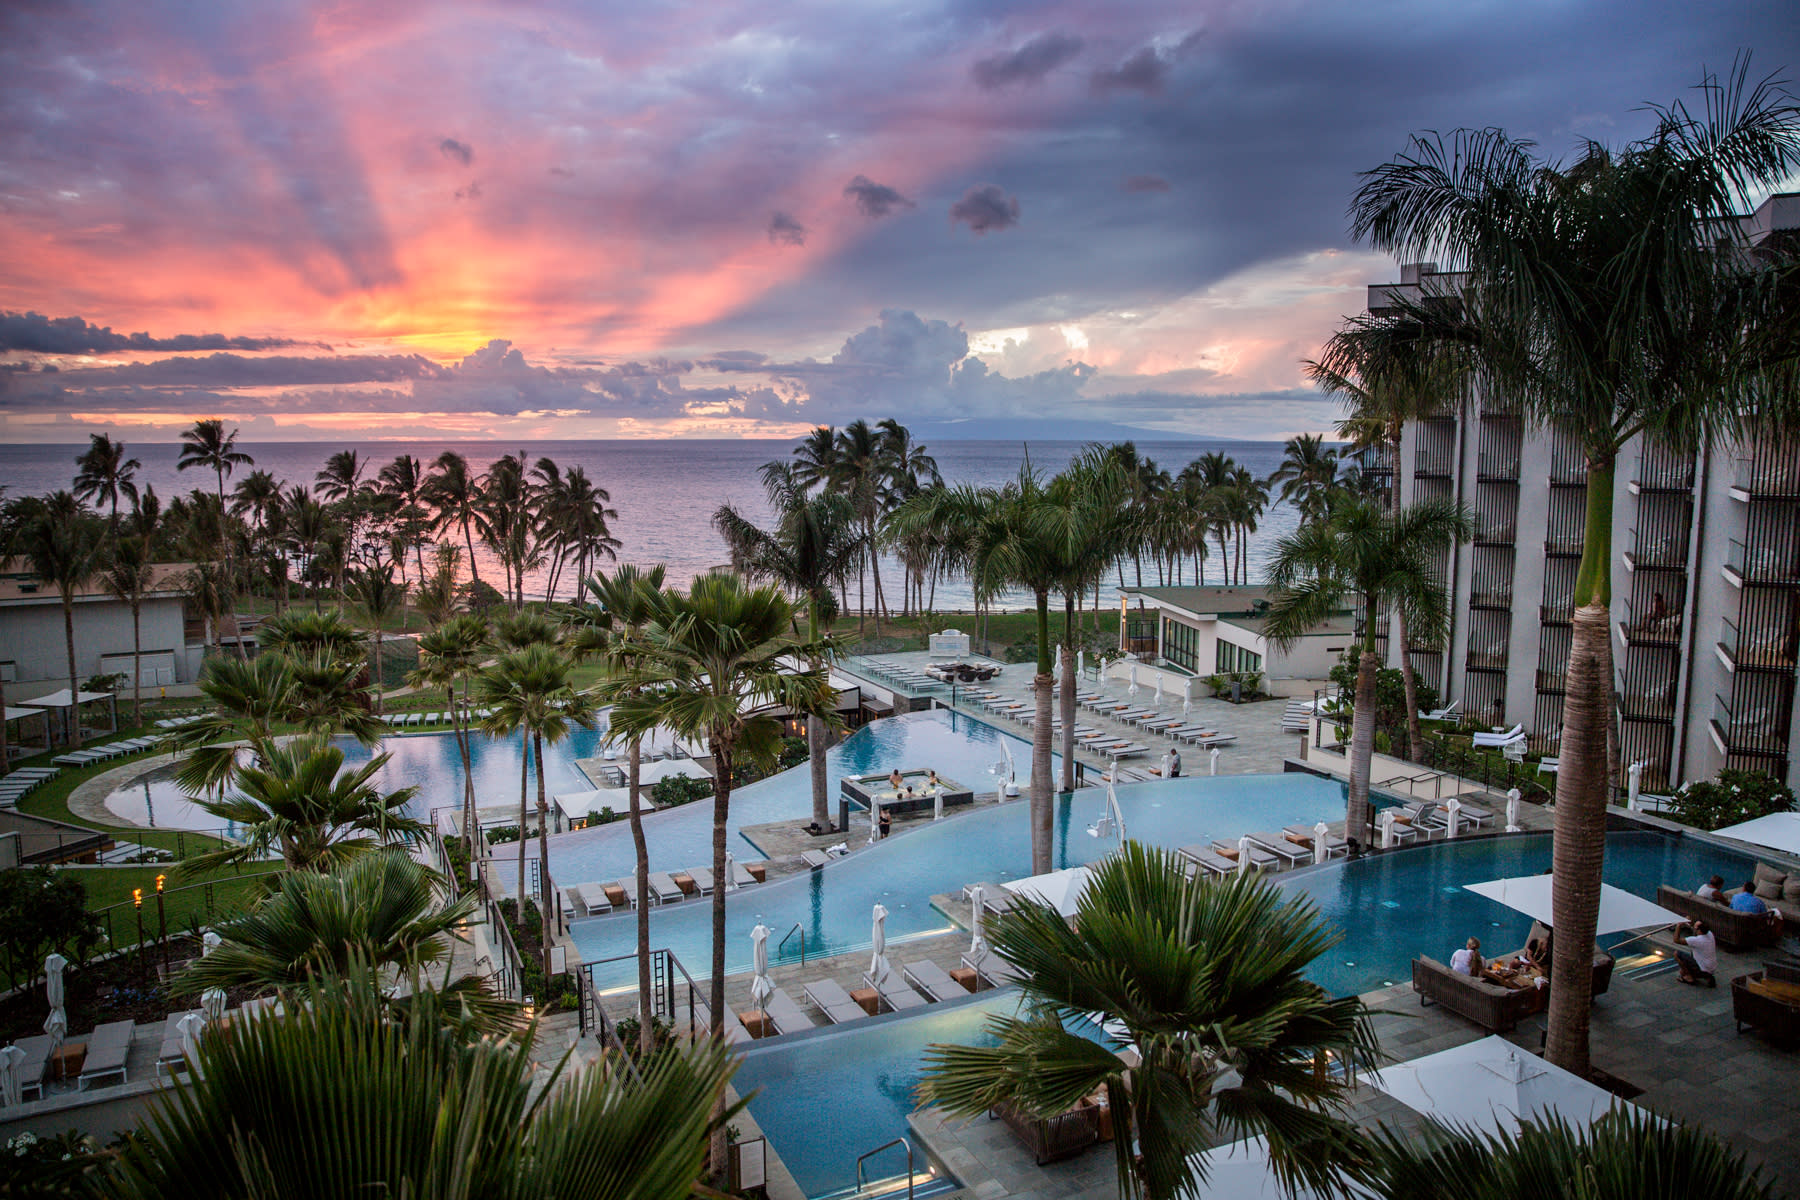 Andaz Maui Pool Deck